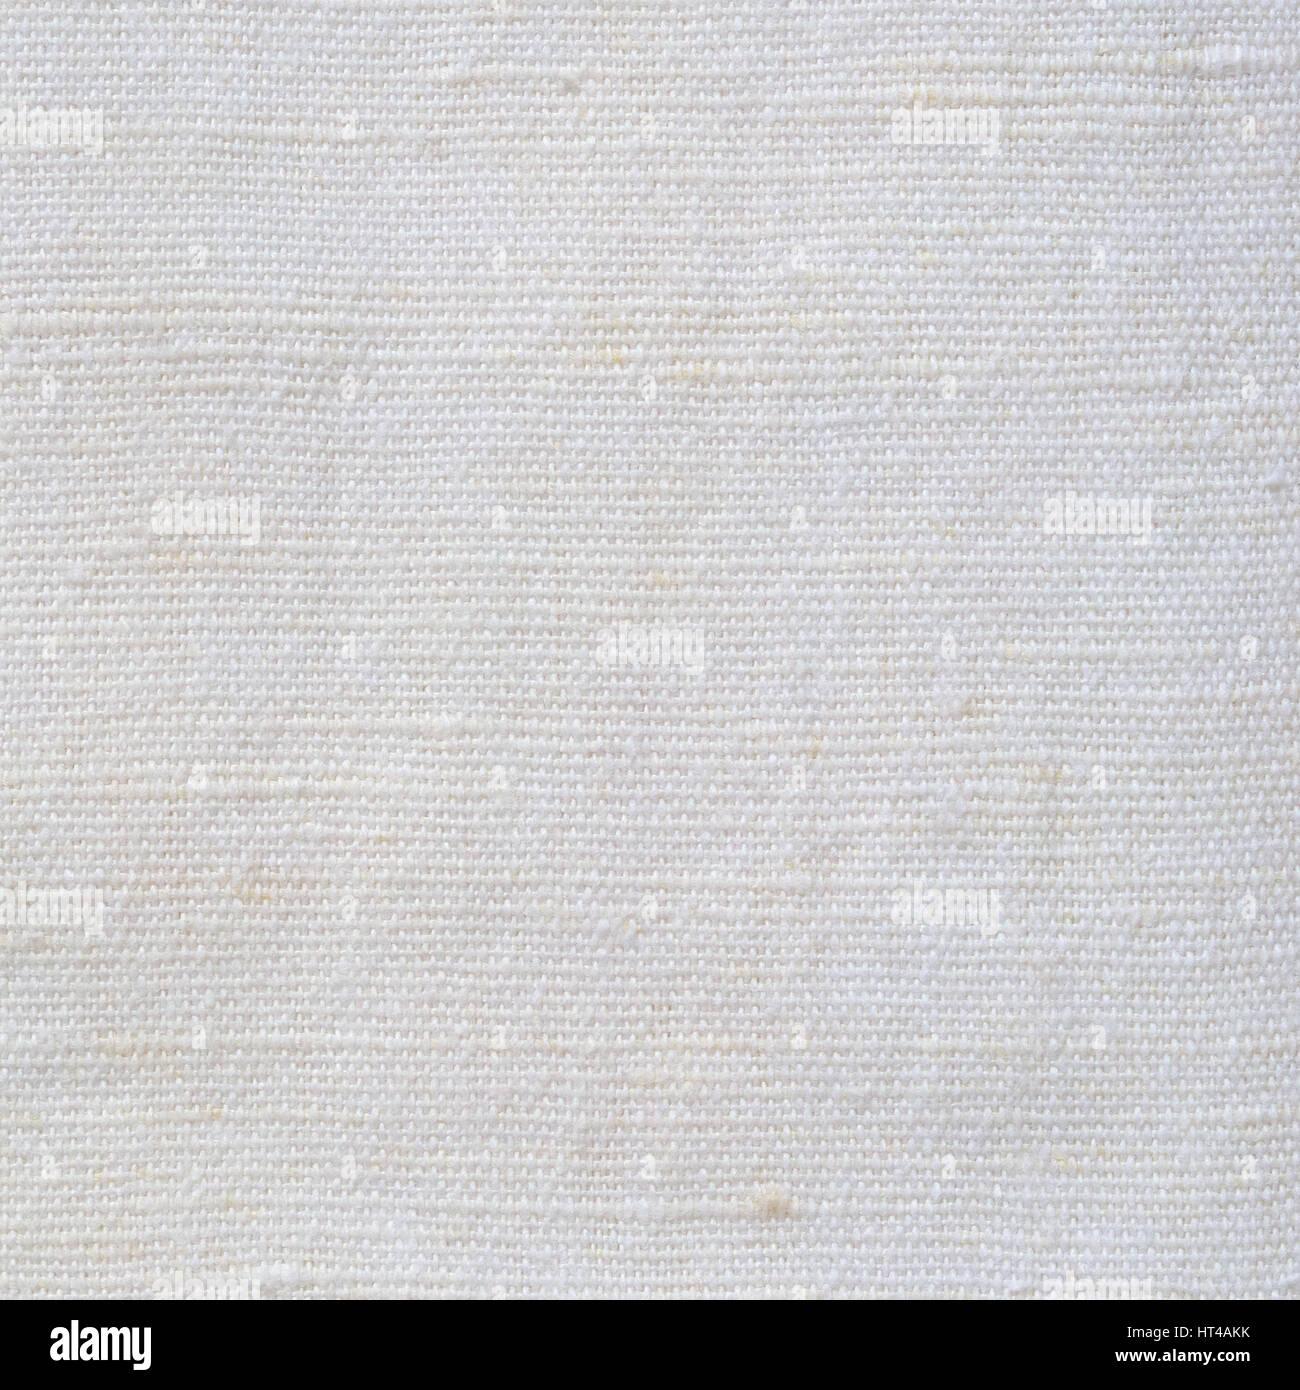 natural bright white flax fiber linen texture detailed macro stock